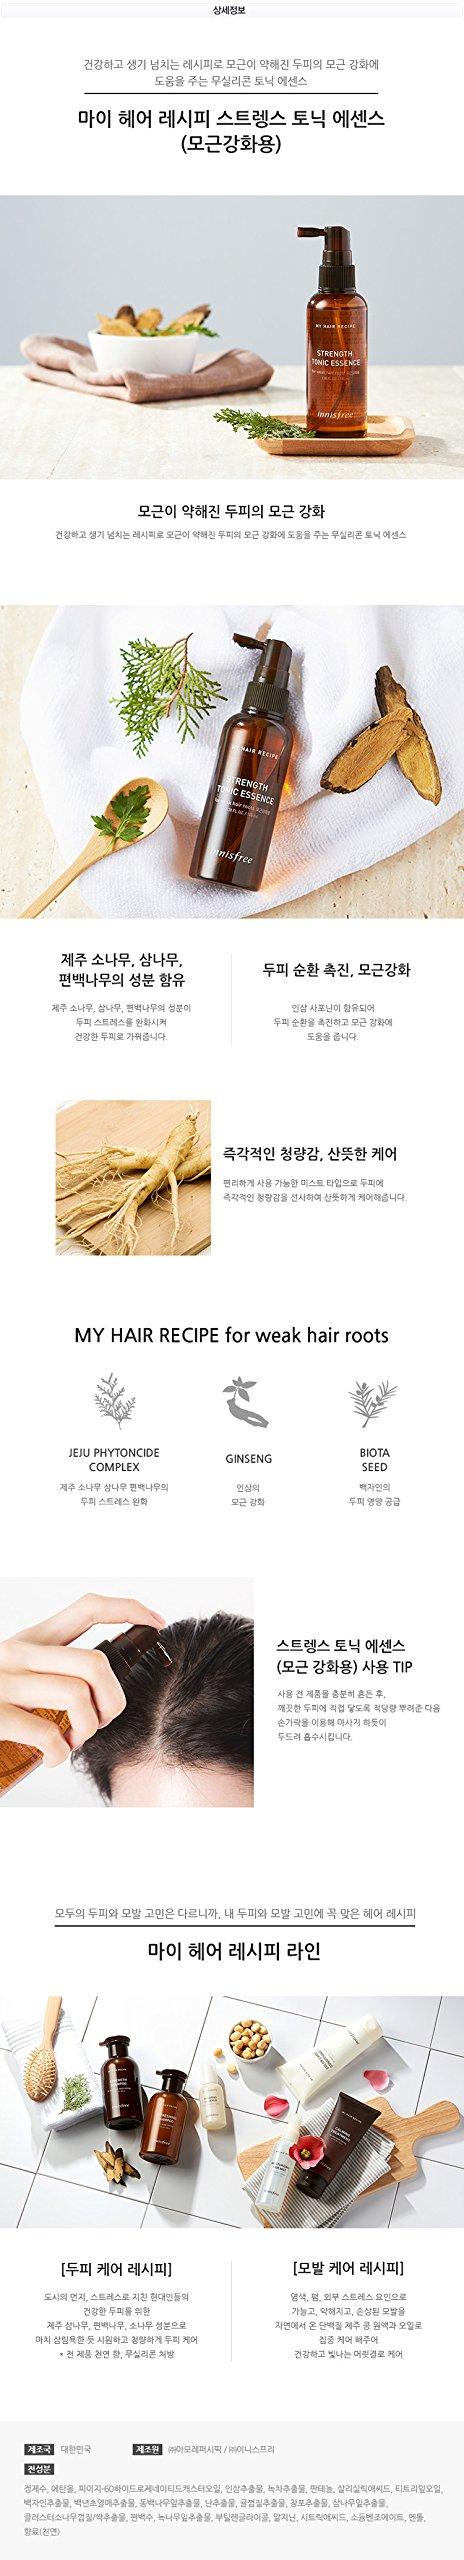 [Innisfree] My Hair Recipe Strength Tonic Essence(for weak hair roots) 100ml by Innisfree